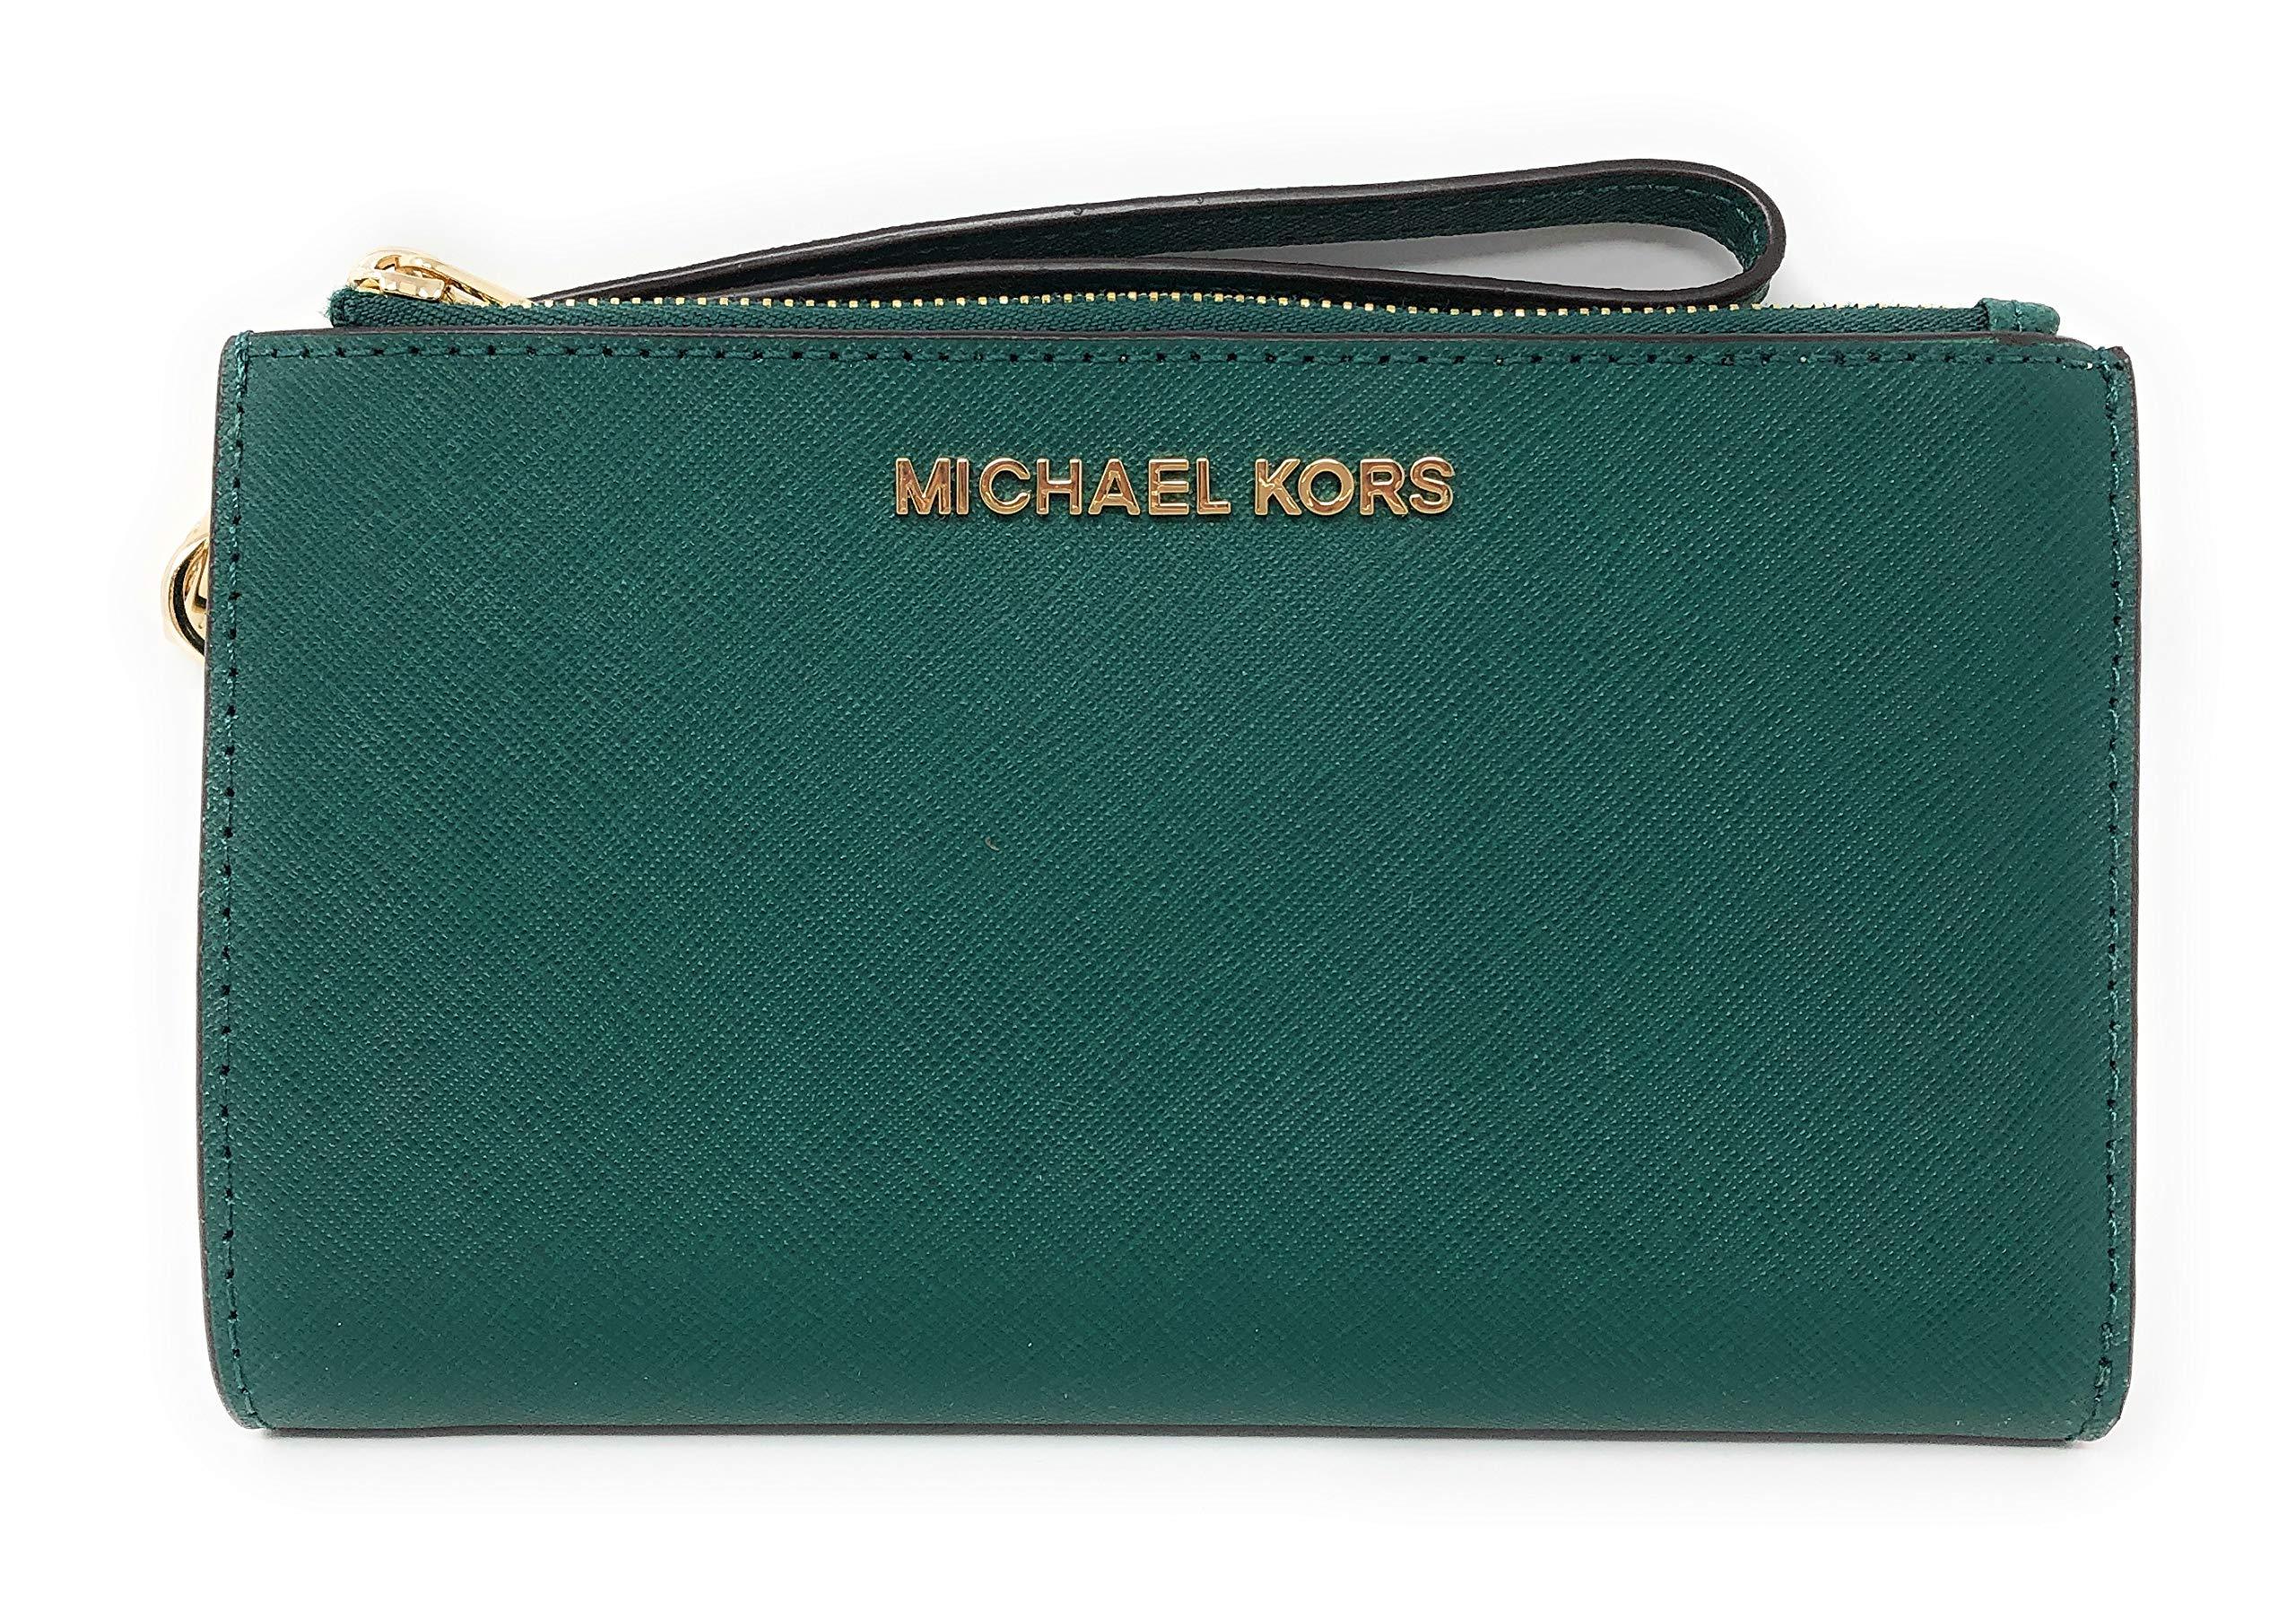 Michael Kors Jet Set Travel Double Zip Saffiano Leather Wristlet Wallet in Emerald by Michael Kors (Image #1)